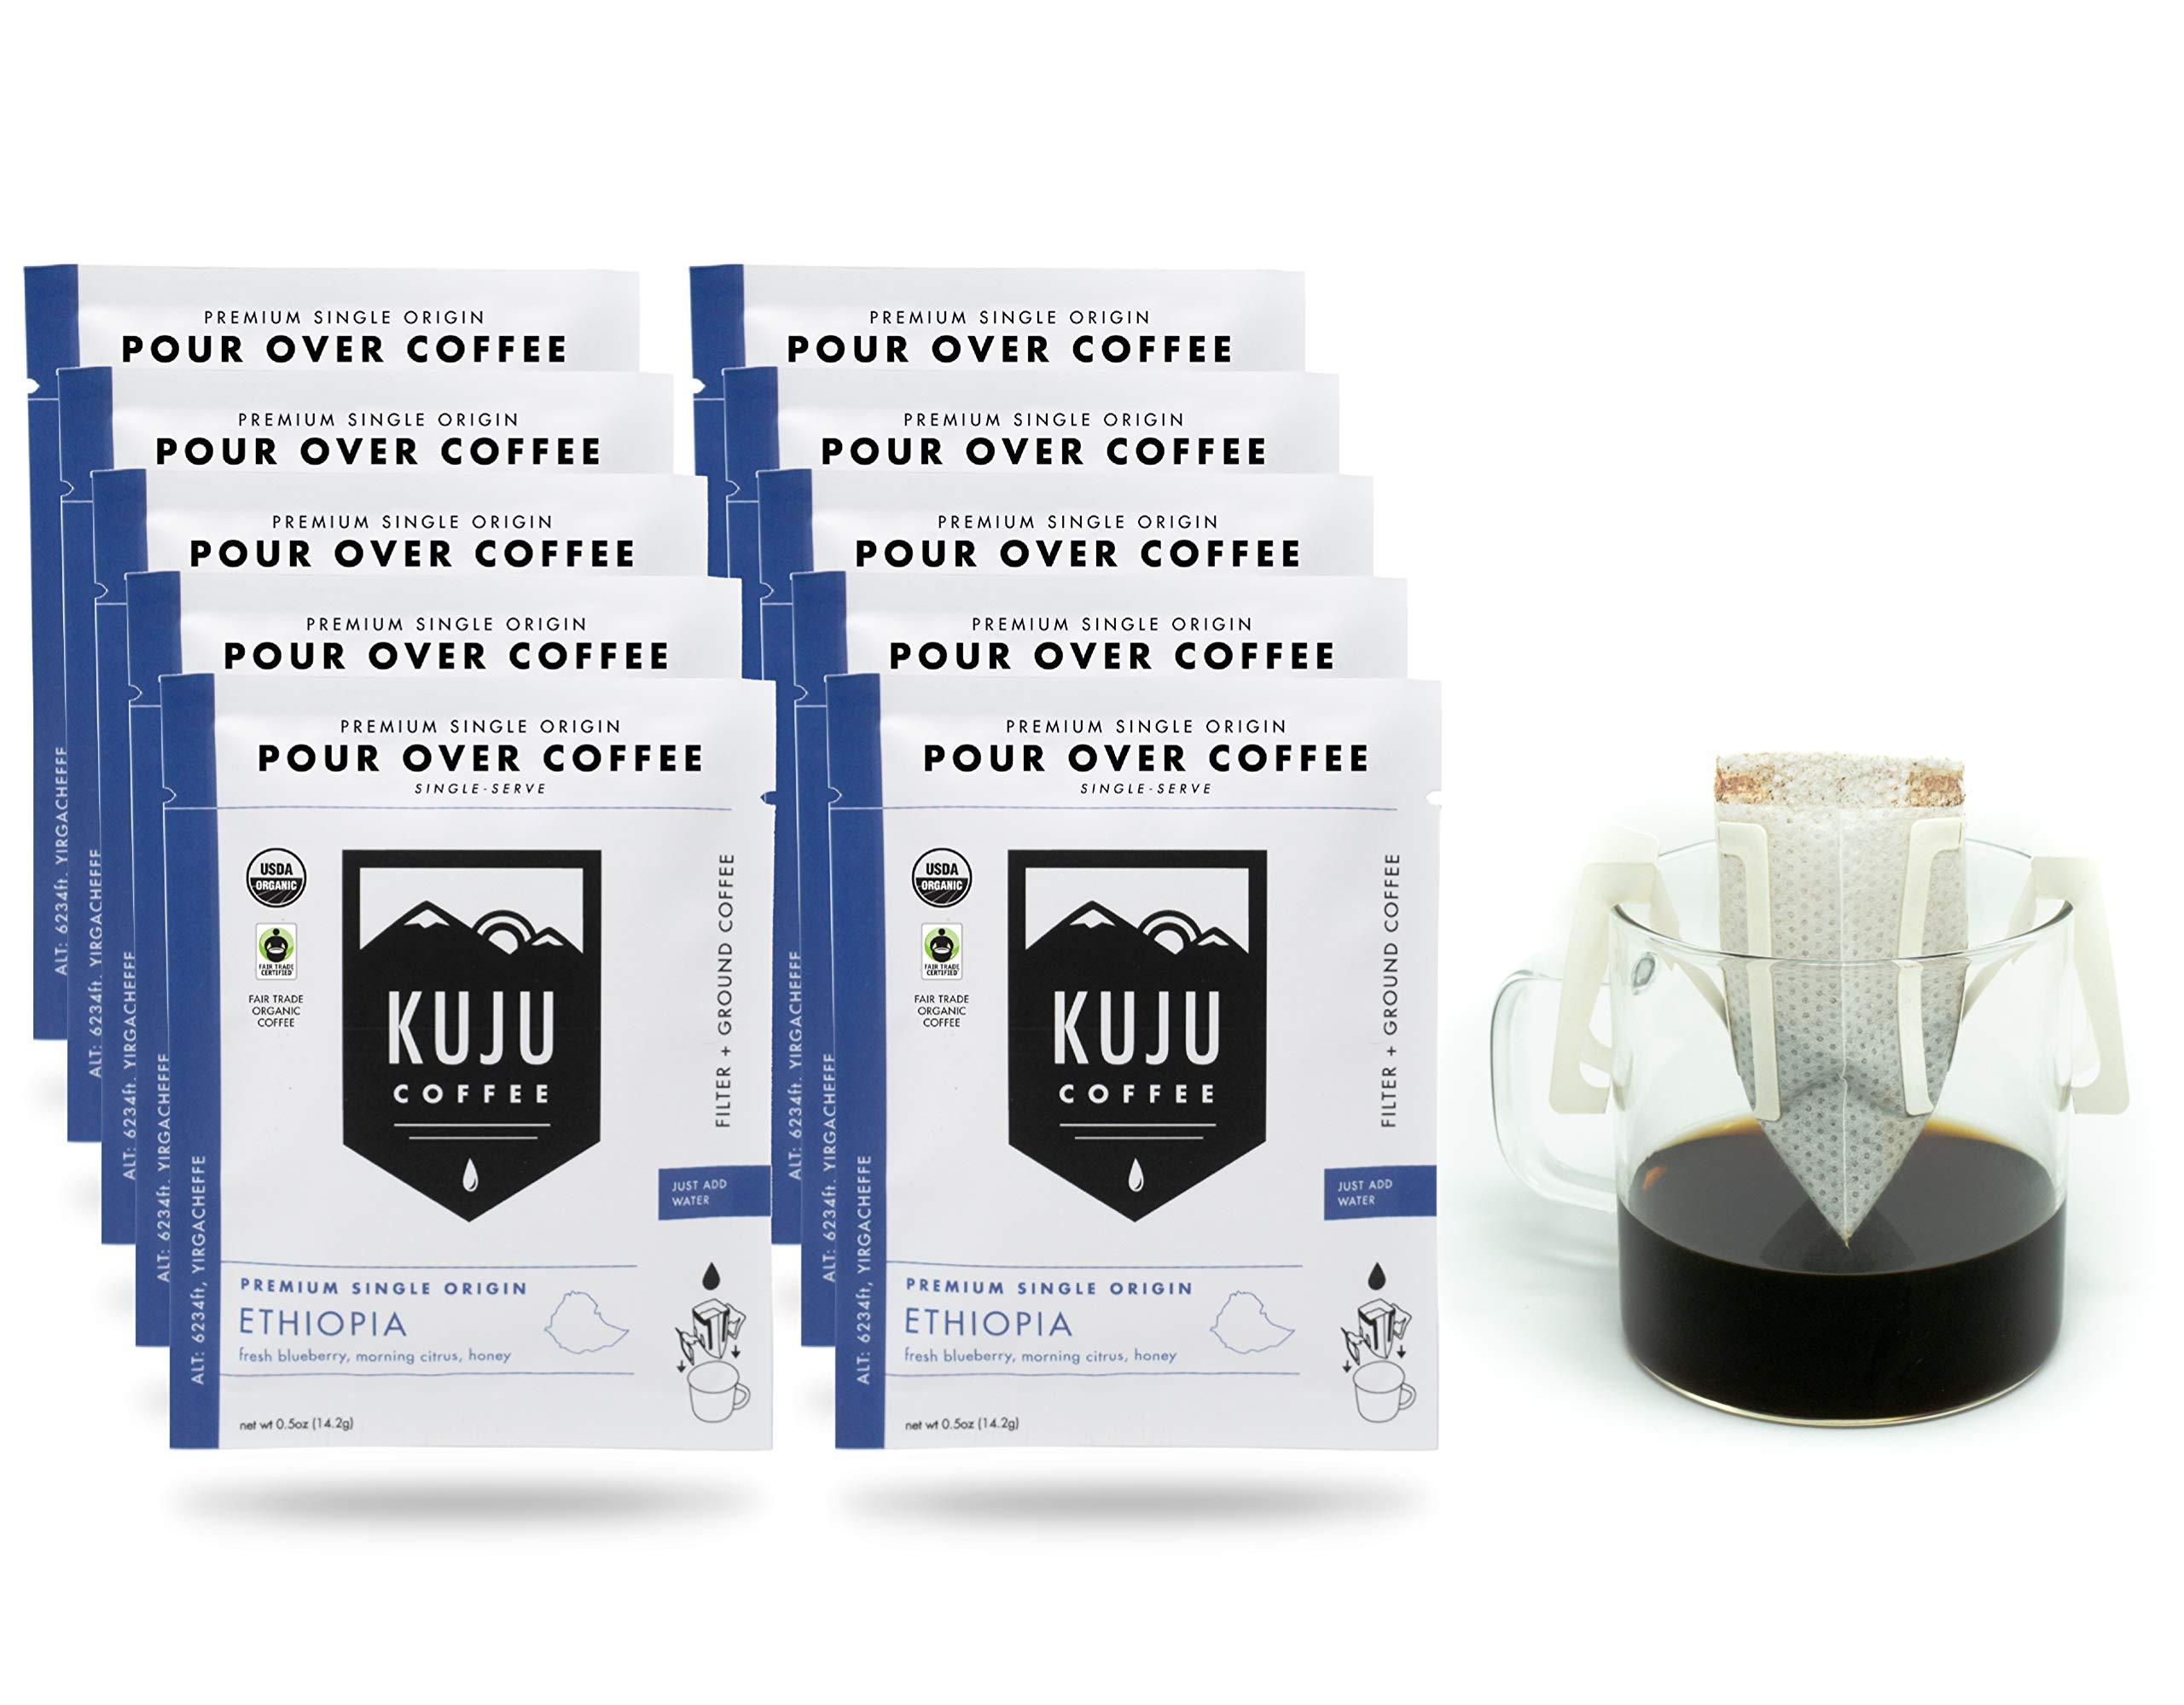 Kuju Coffee Premium Single-Serve Pour Over Coffee   Fair Trade Certified, USDA Organic, Single Origin Coffee, Eco-Friendly   Ethiopia - Yirgacheffe, 10-pack